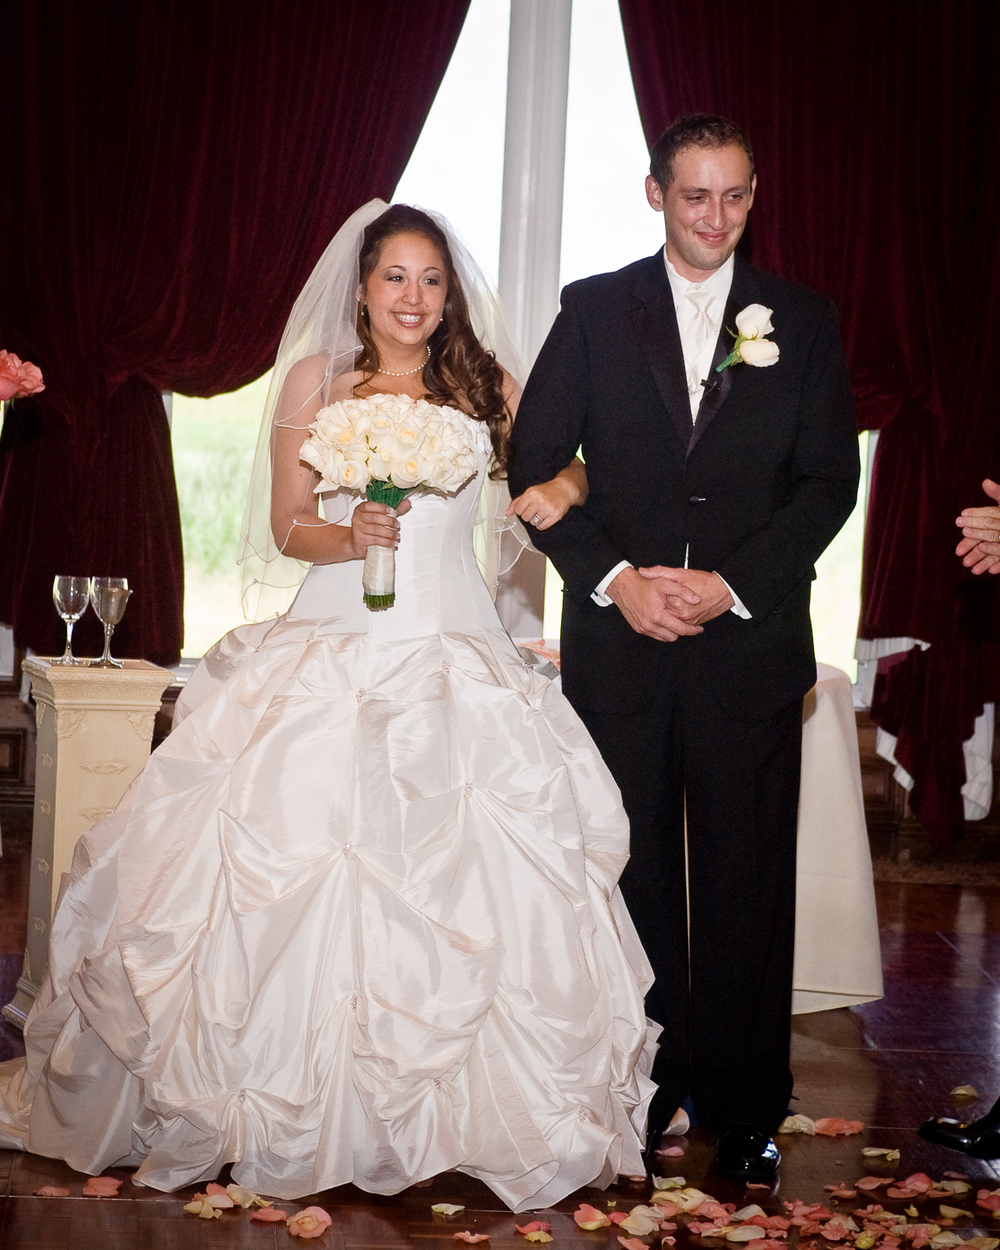 Michael-Napier-Weddings-Traylor-Cohen-Wedding-Album- (14).jpg